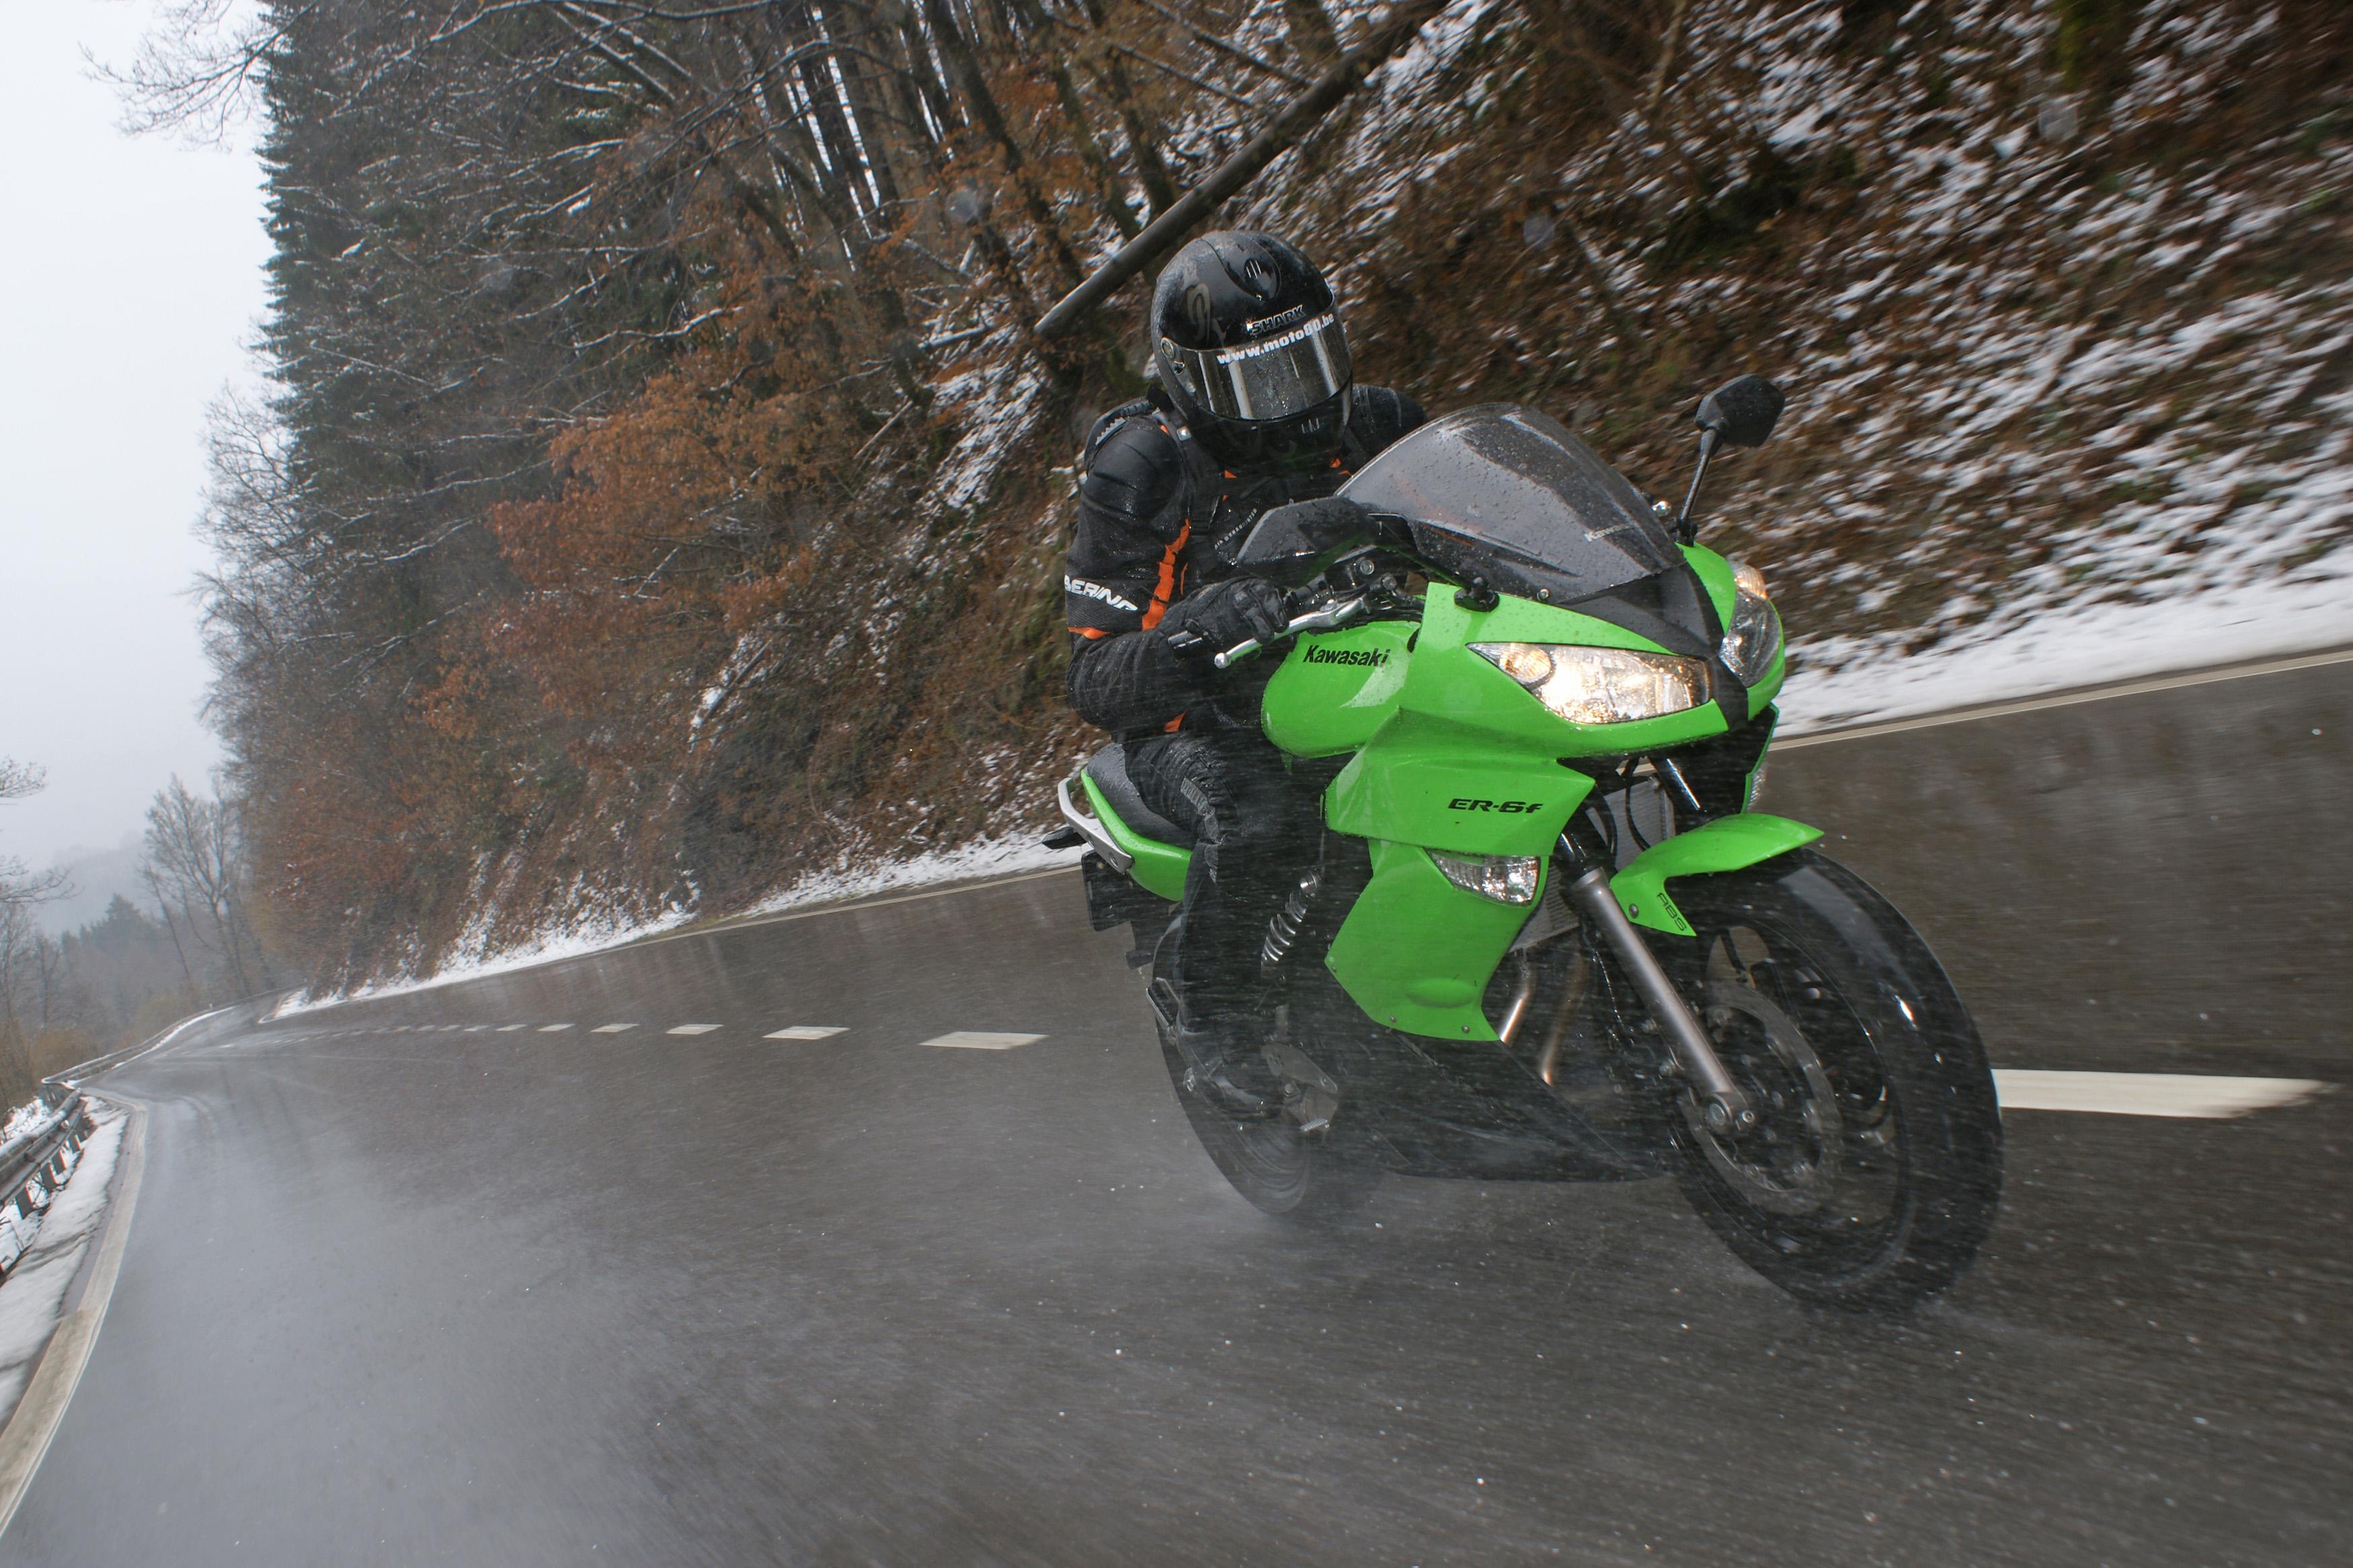 19+ Richtig bremsen mit dem Motorrad   ADAC Kollektion